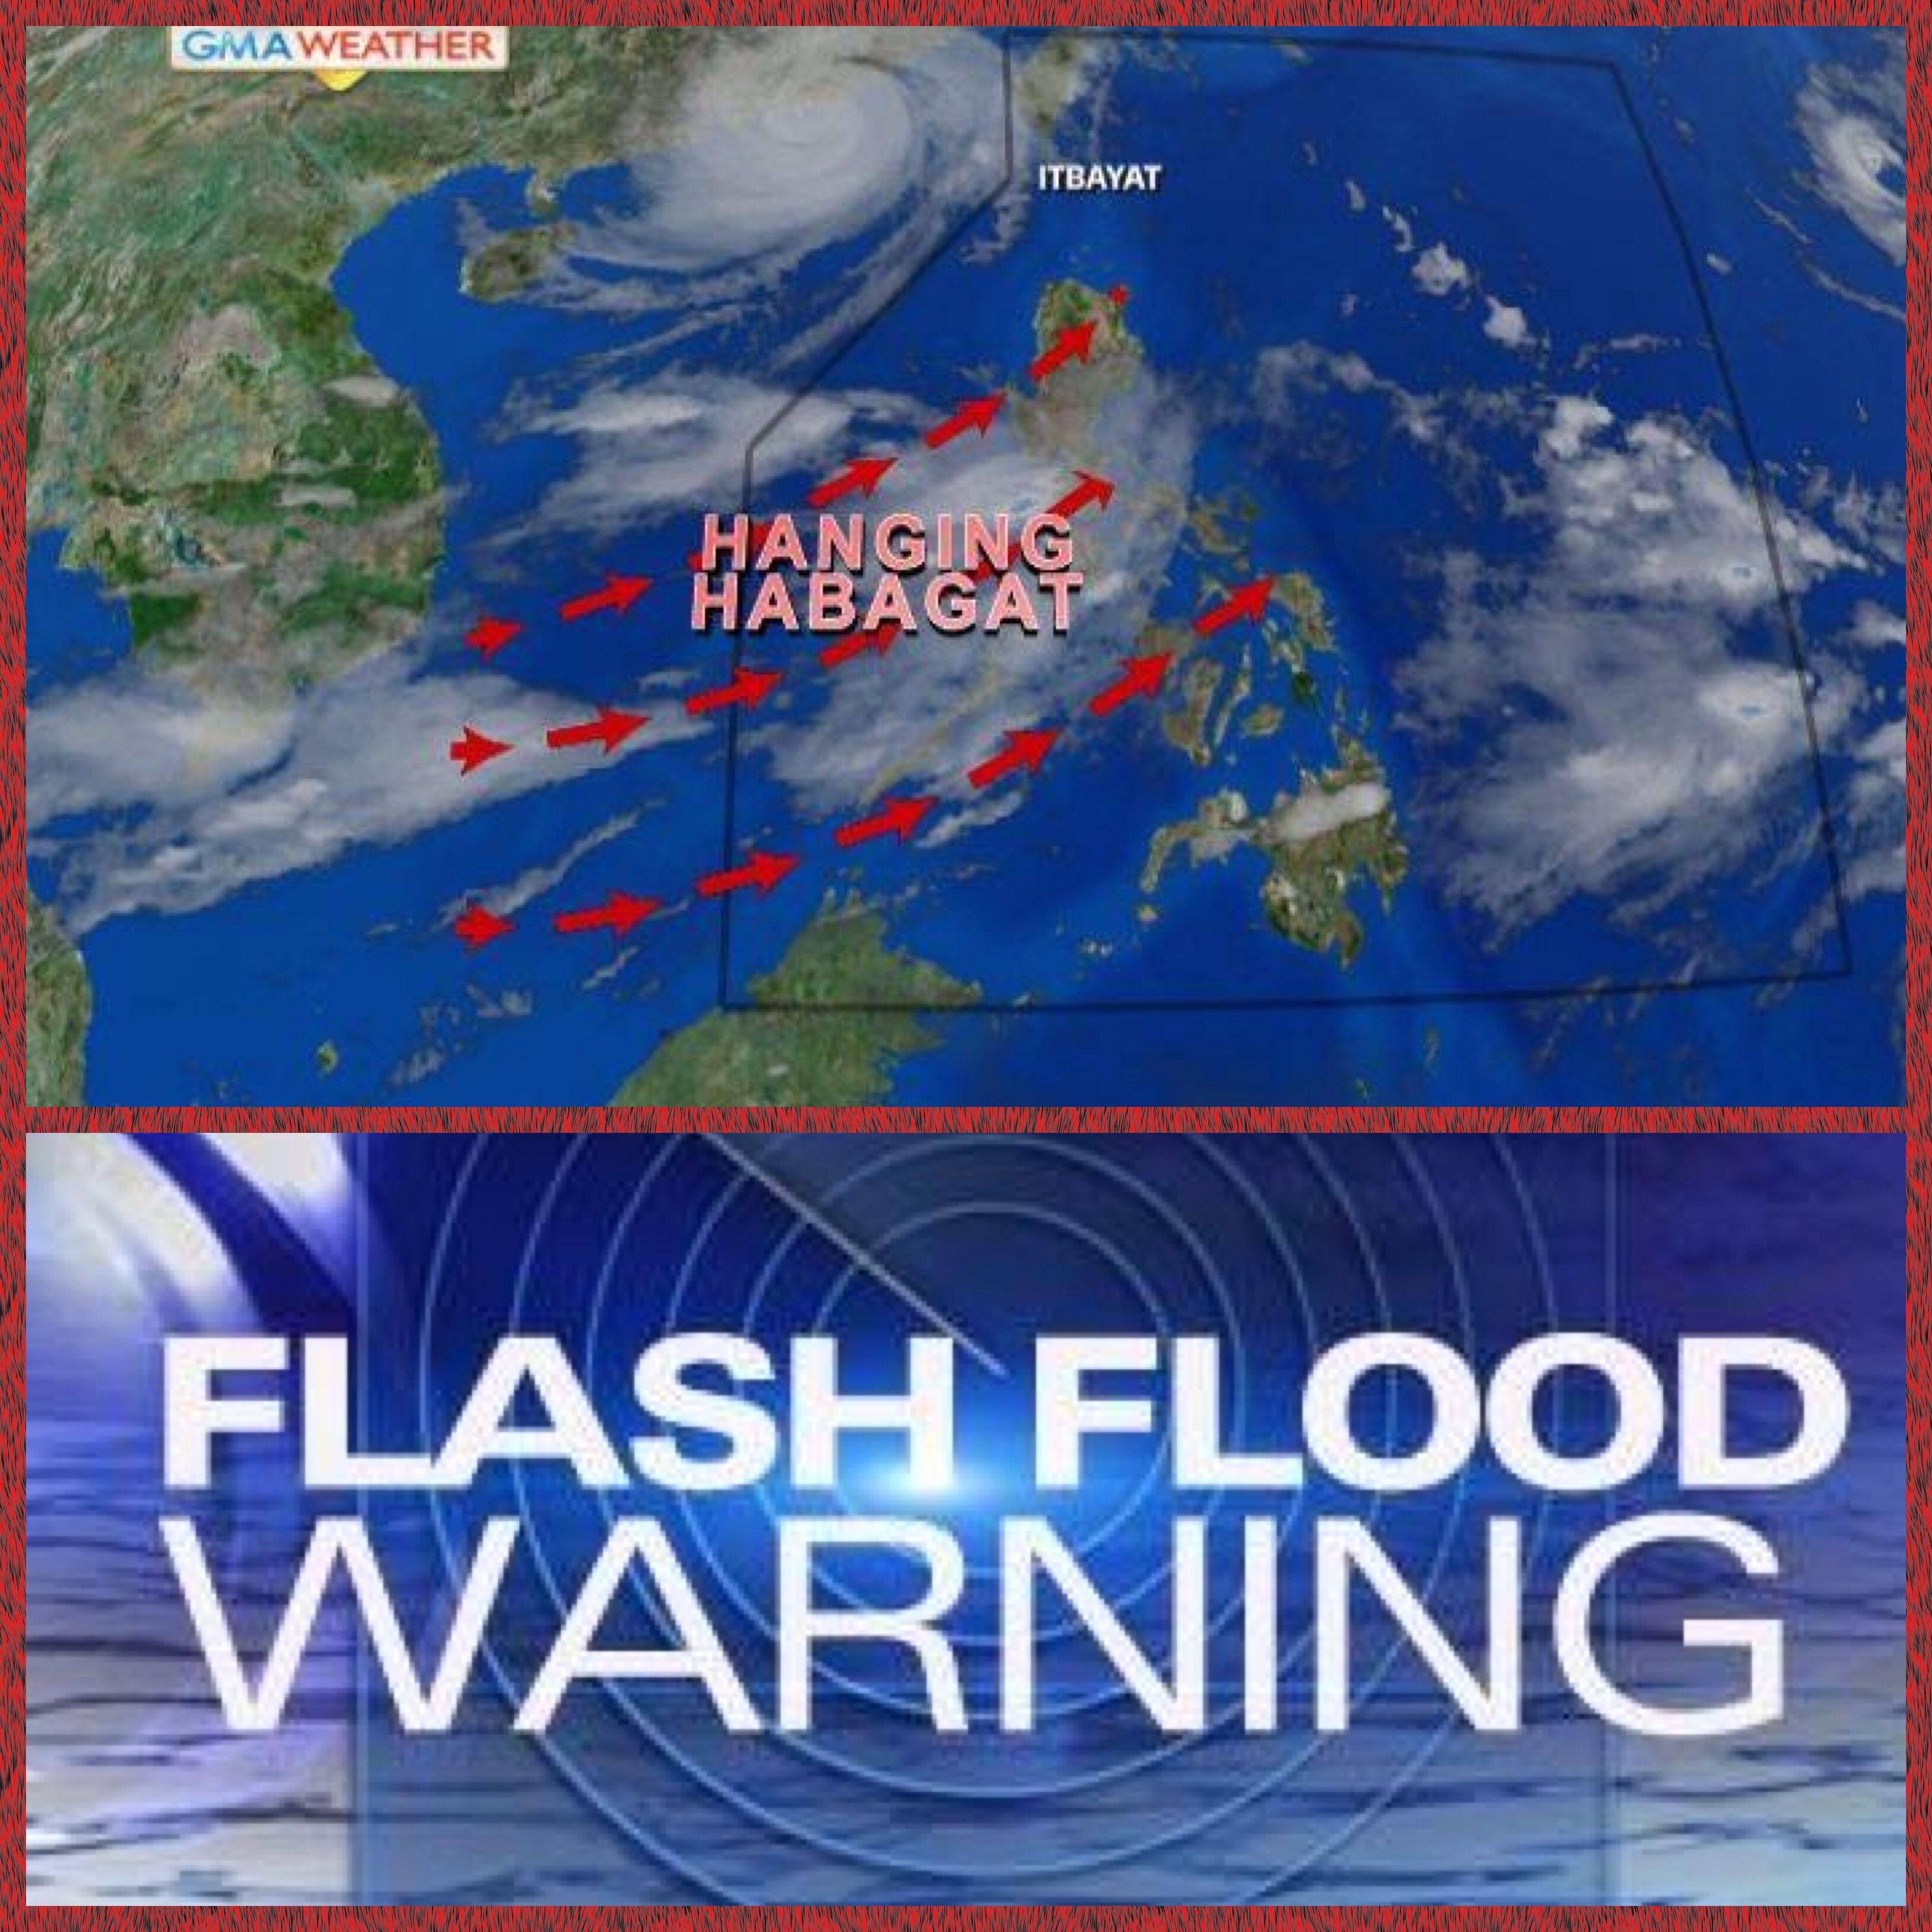 Super Typhoon Odette Usagi Left The Philippines Saturday Night But It Continues To Enhance The Southwest Monsoon B Occidental Mindoro Zambales Flood Warning